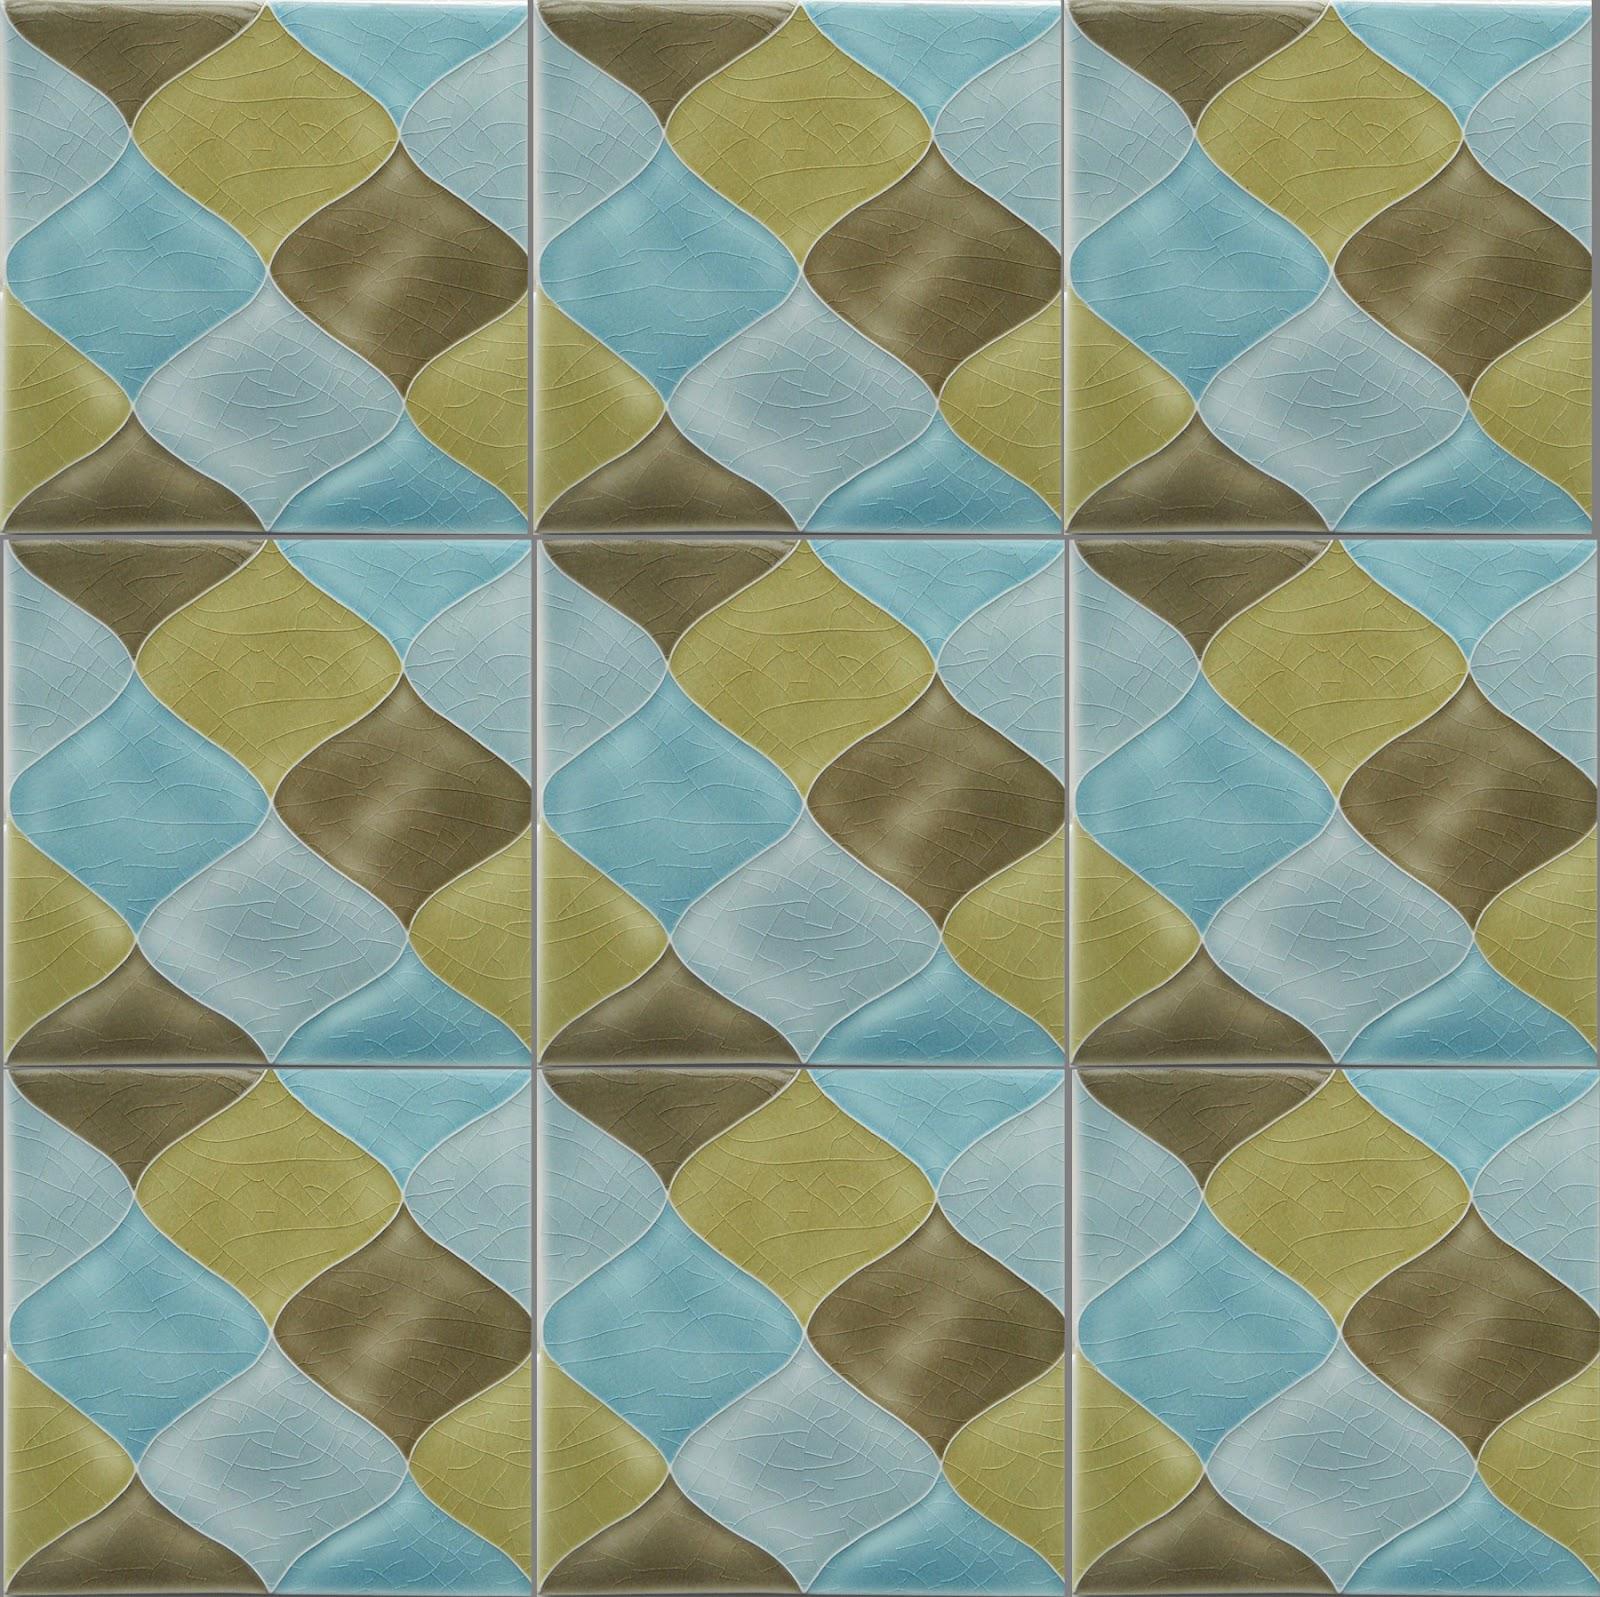 pratt and larson tile motif part 2 looking at the larger. Black Bedroom Furniture Sets. Home Design Ideas